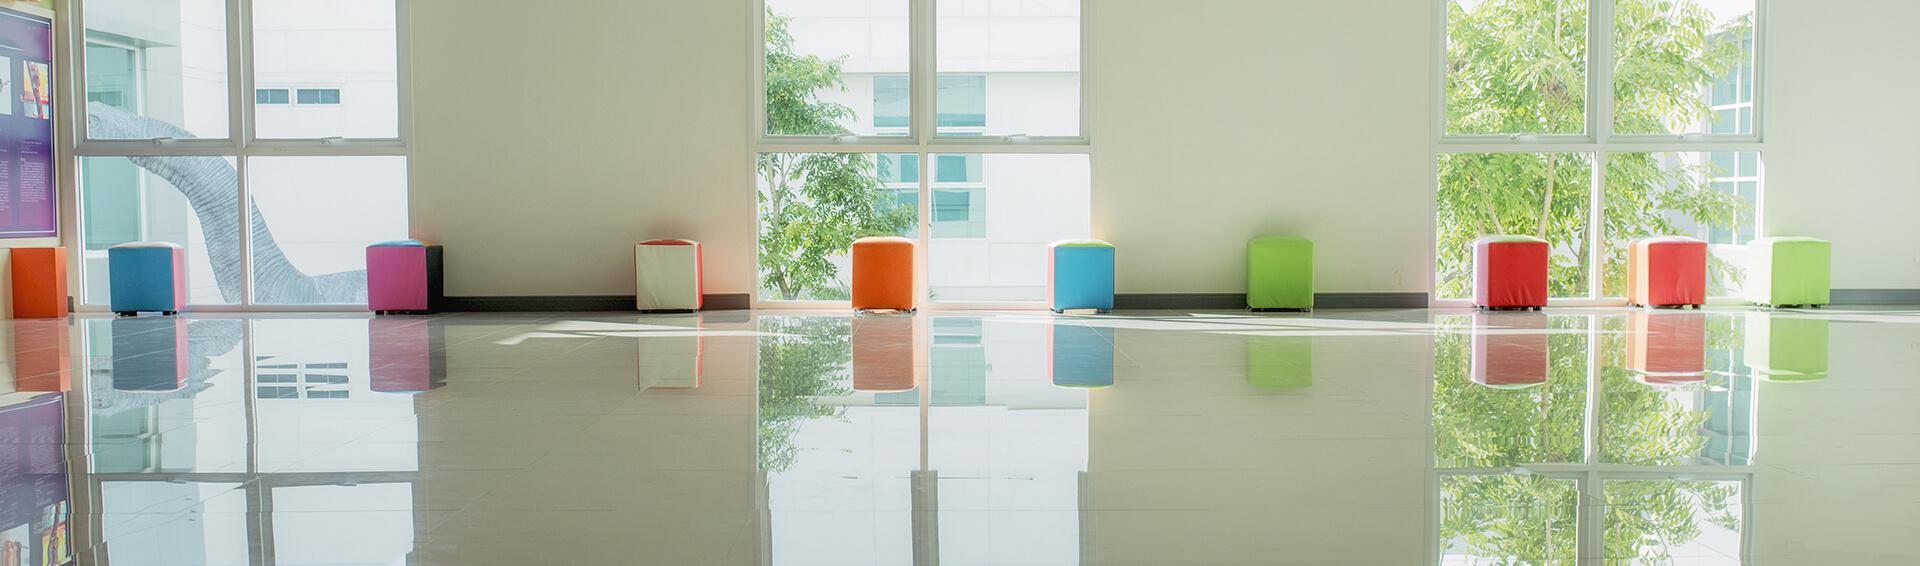 epoxy coating flooring